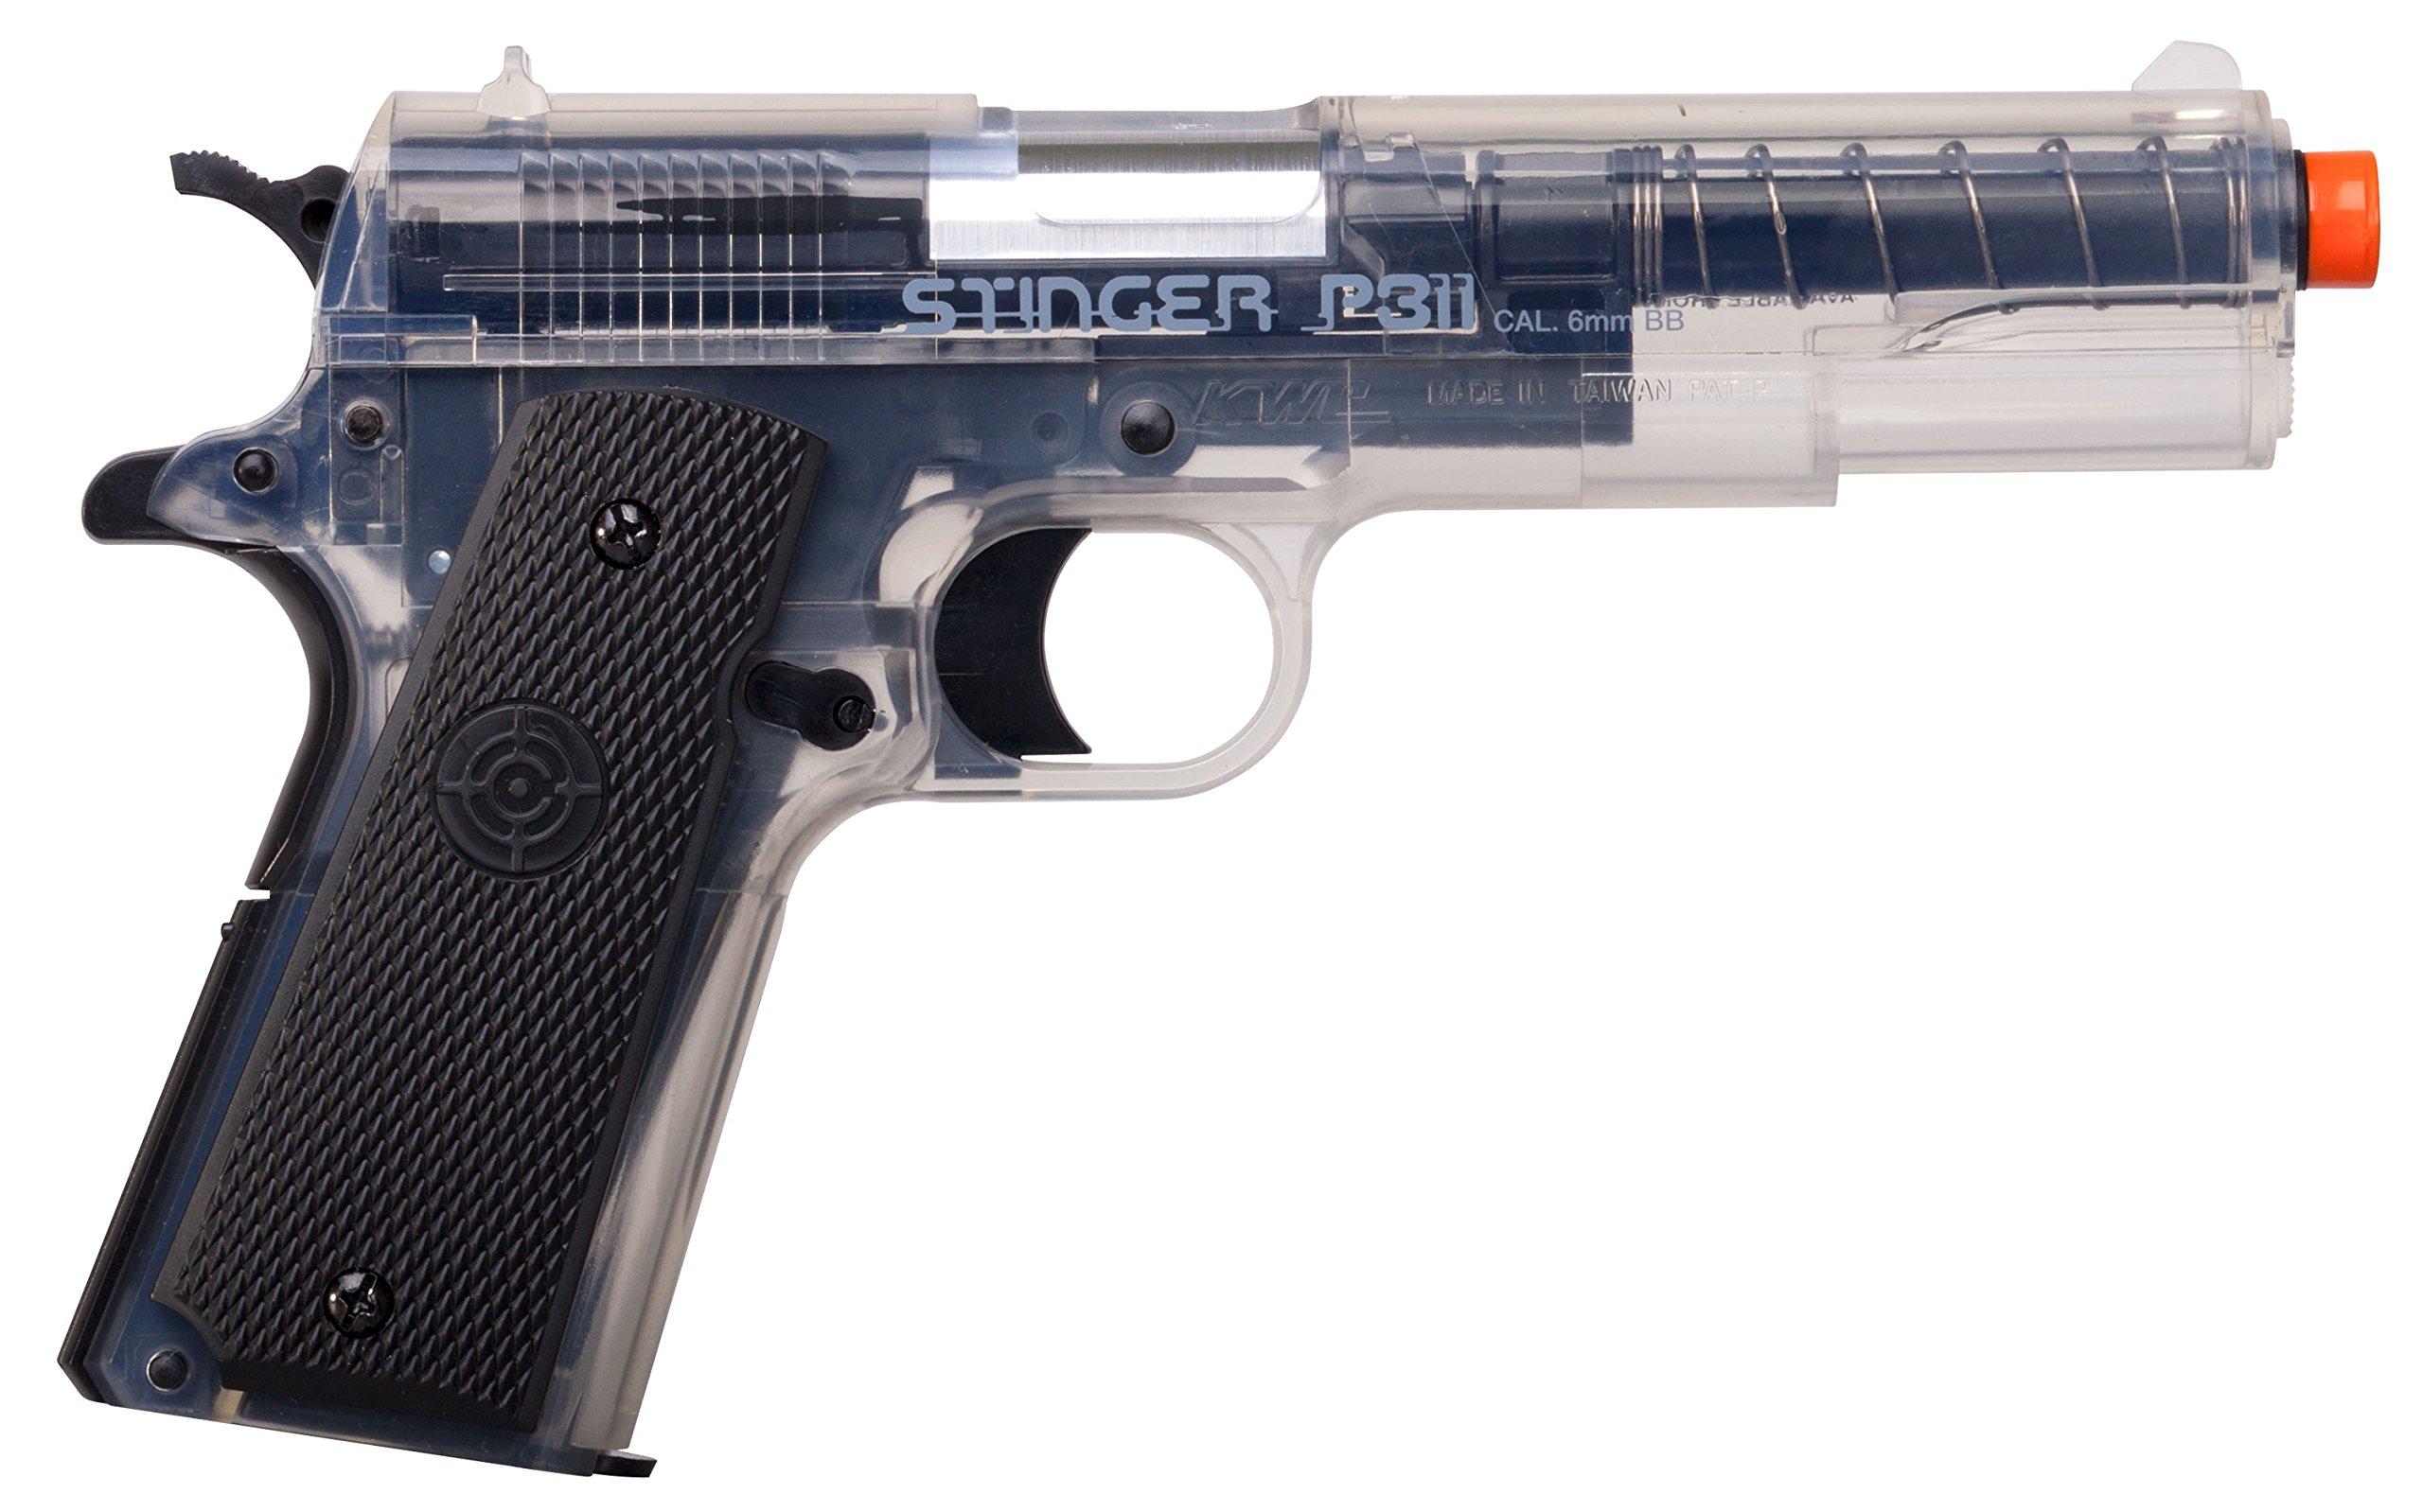 stinger p311 airsoft pistol(Airsoft Gun) by Crosman